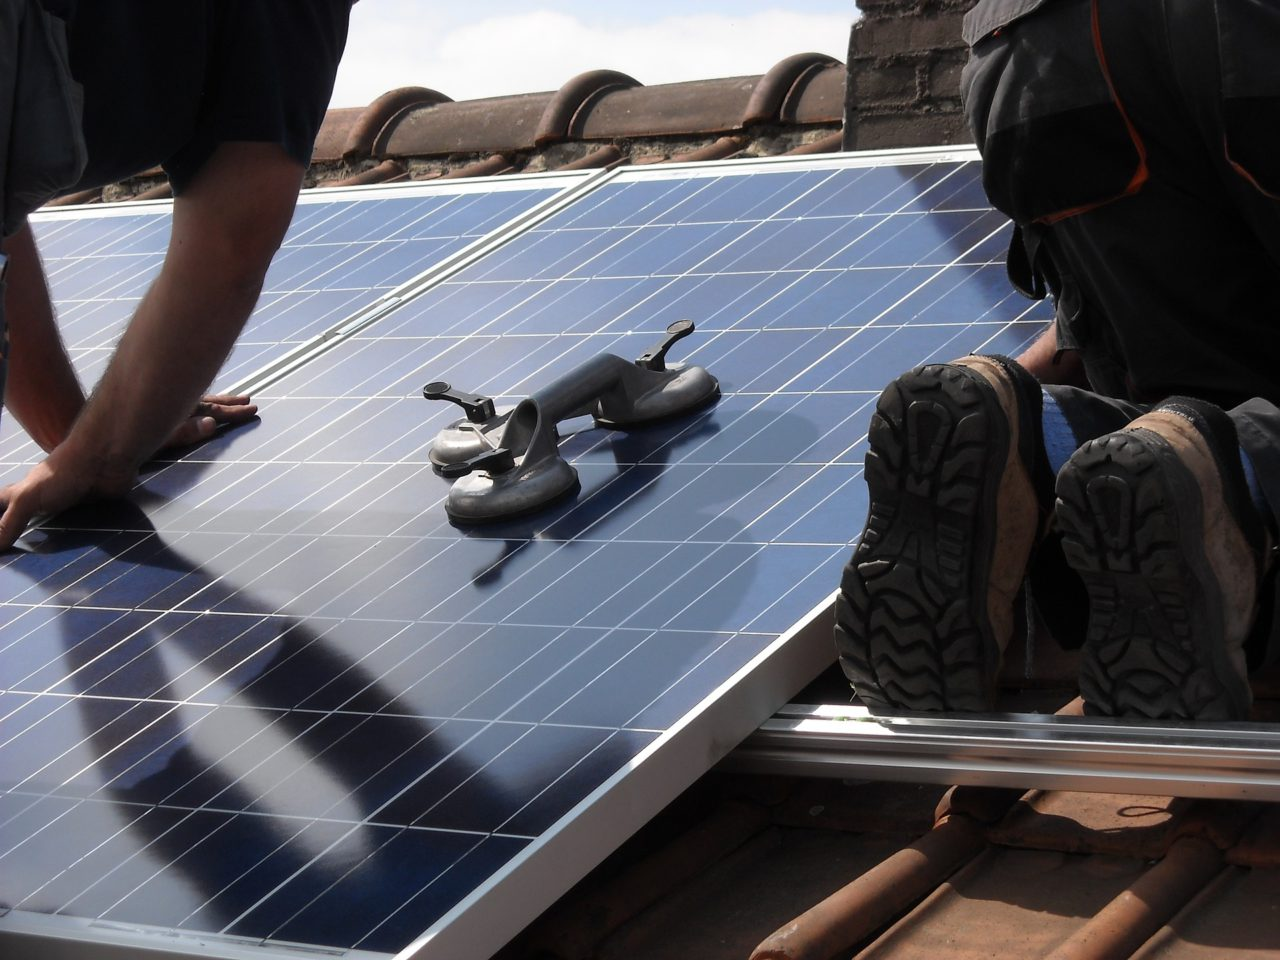 solar-panels-944002_1920-1280x960.jpg